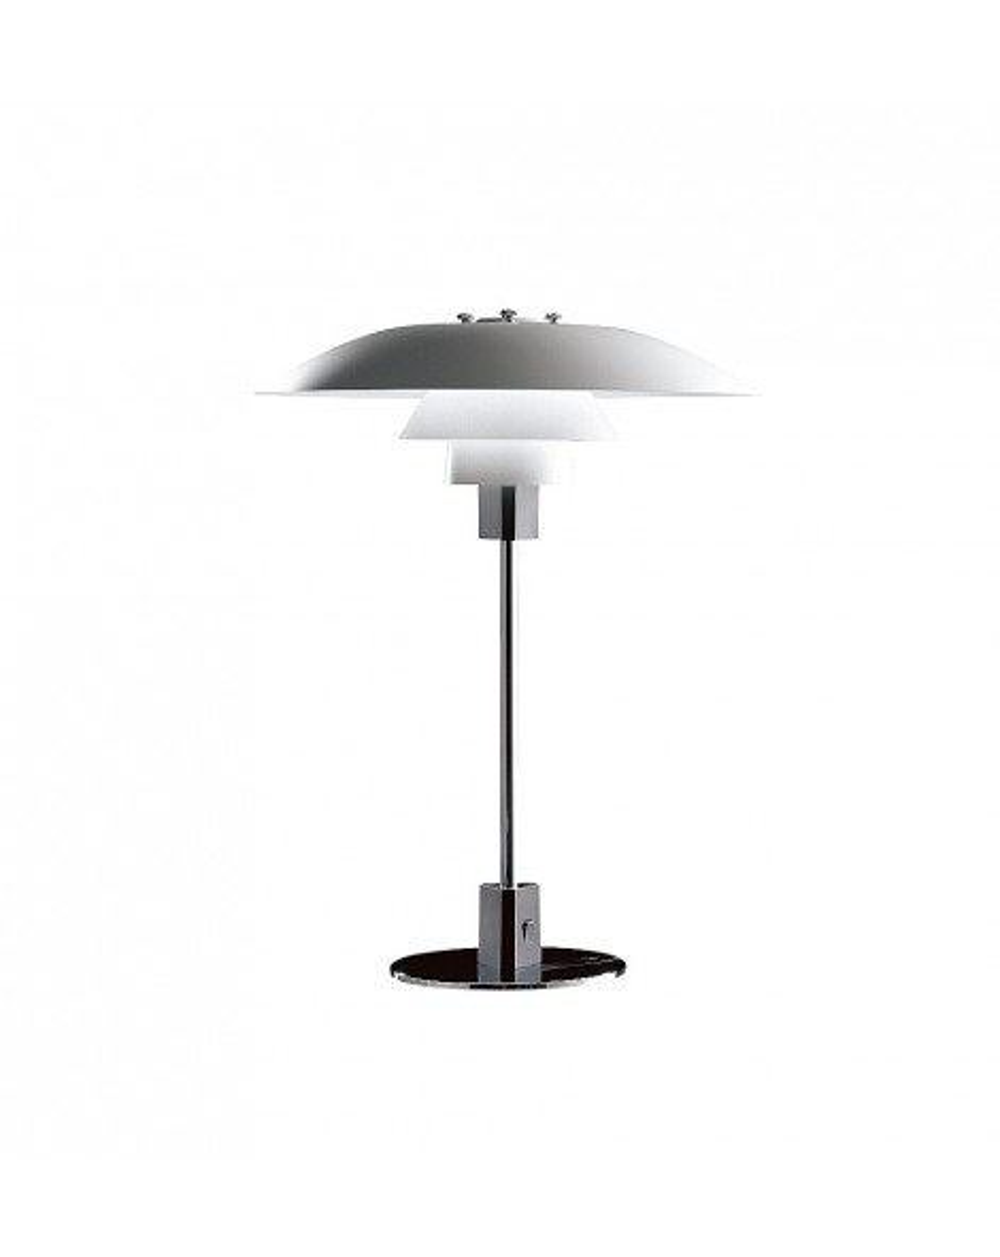 PH 4-3 LAMPE DE TABLE